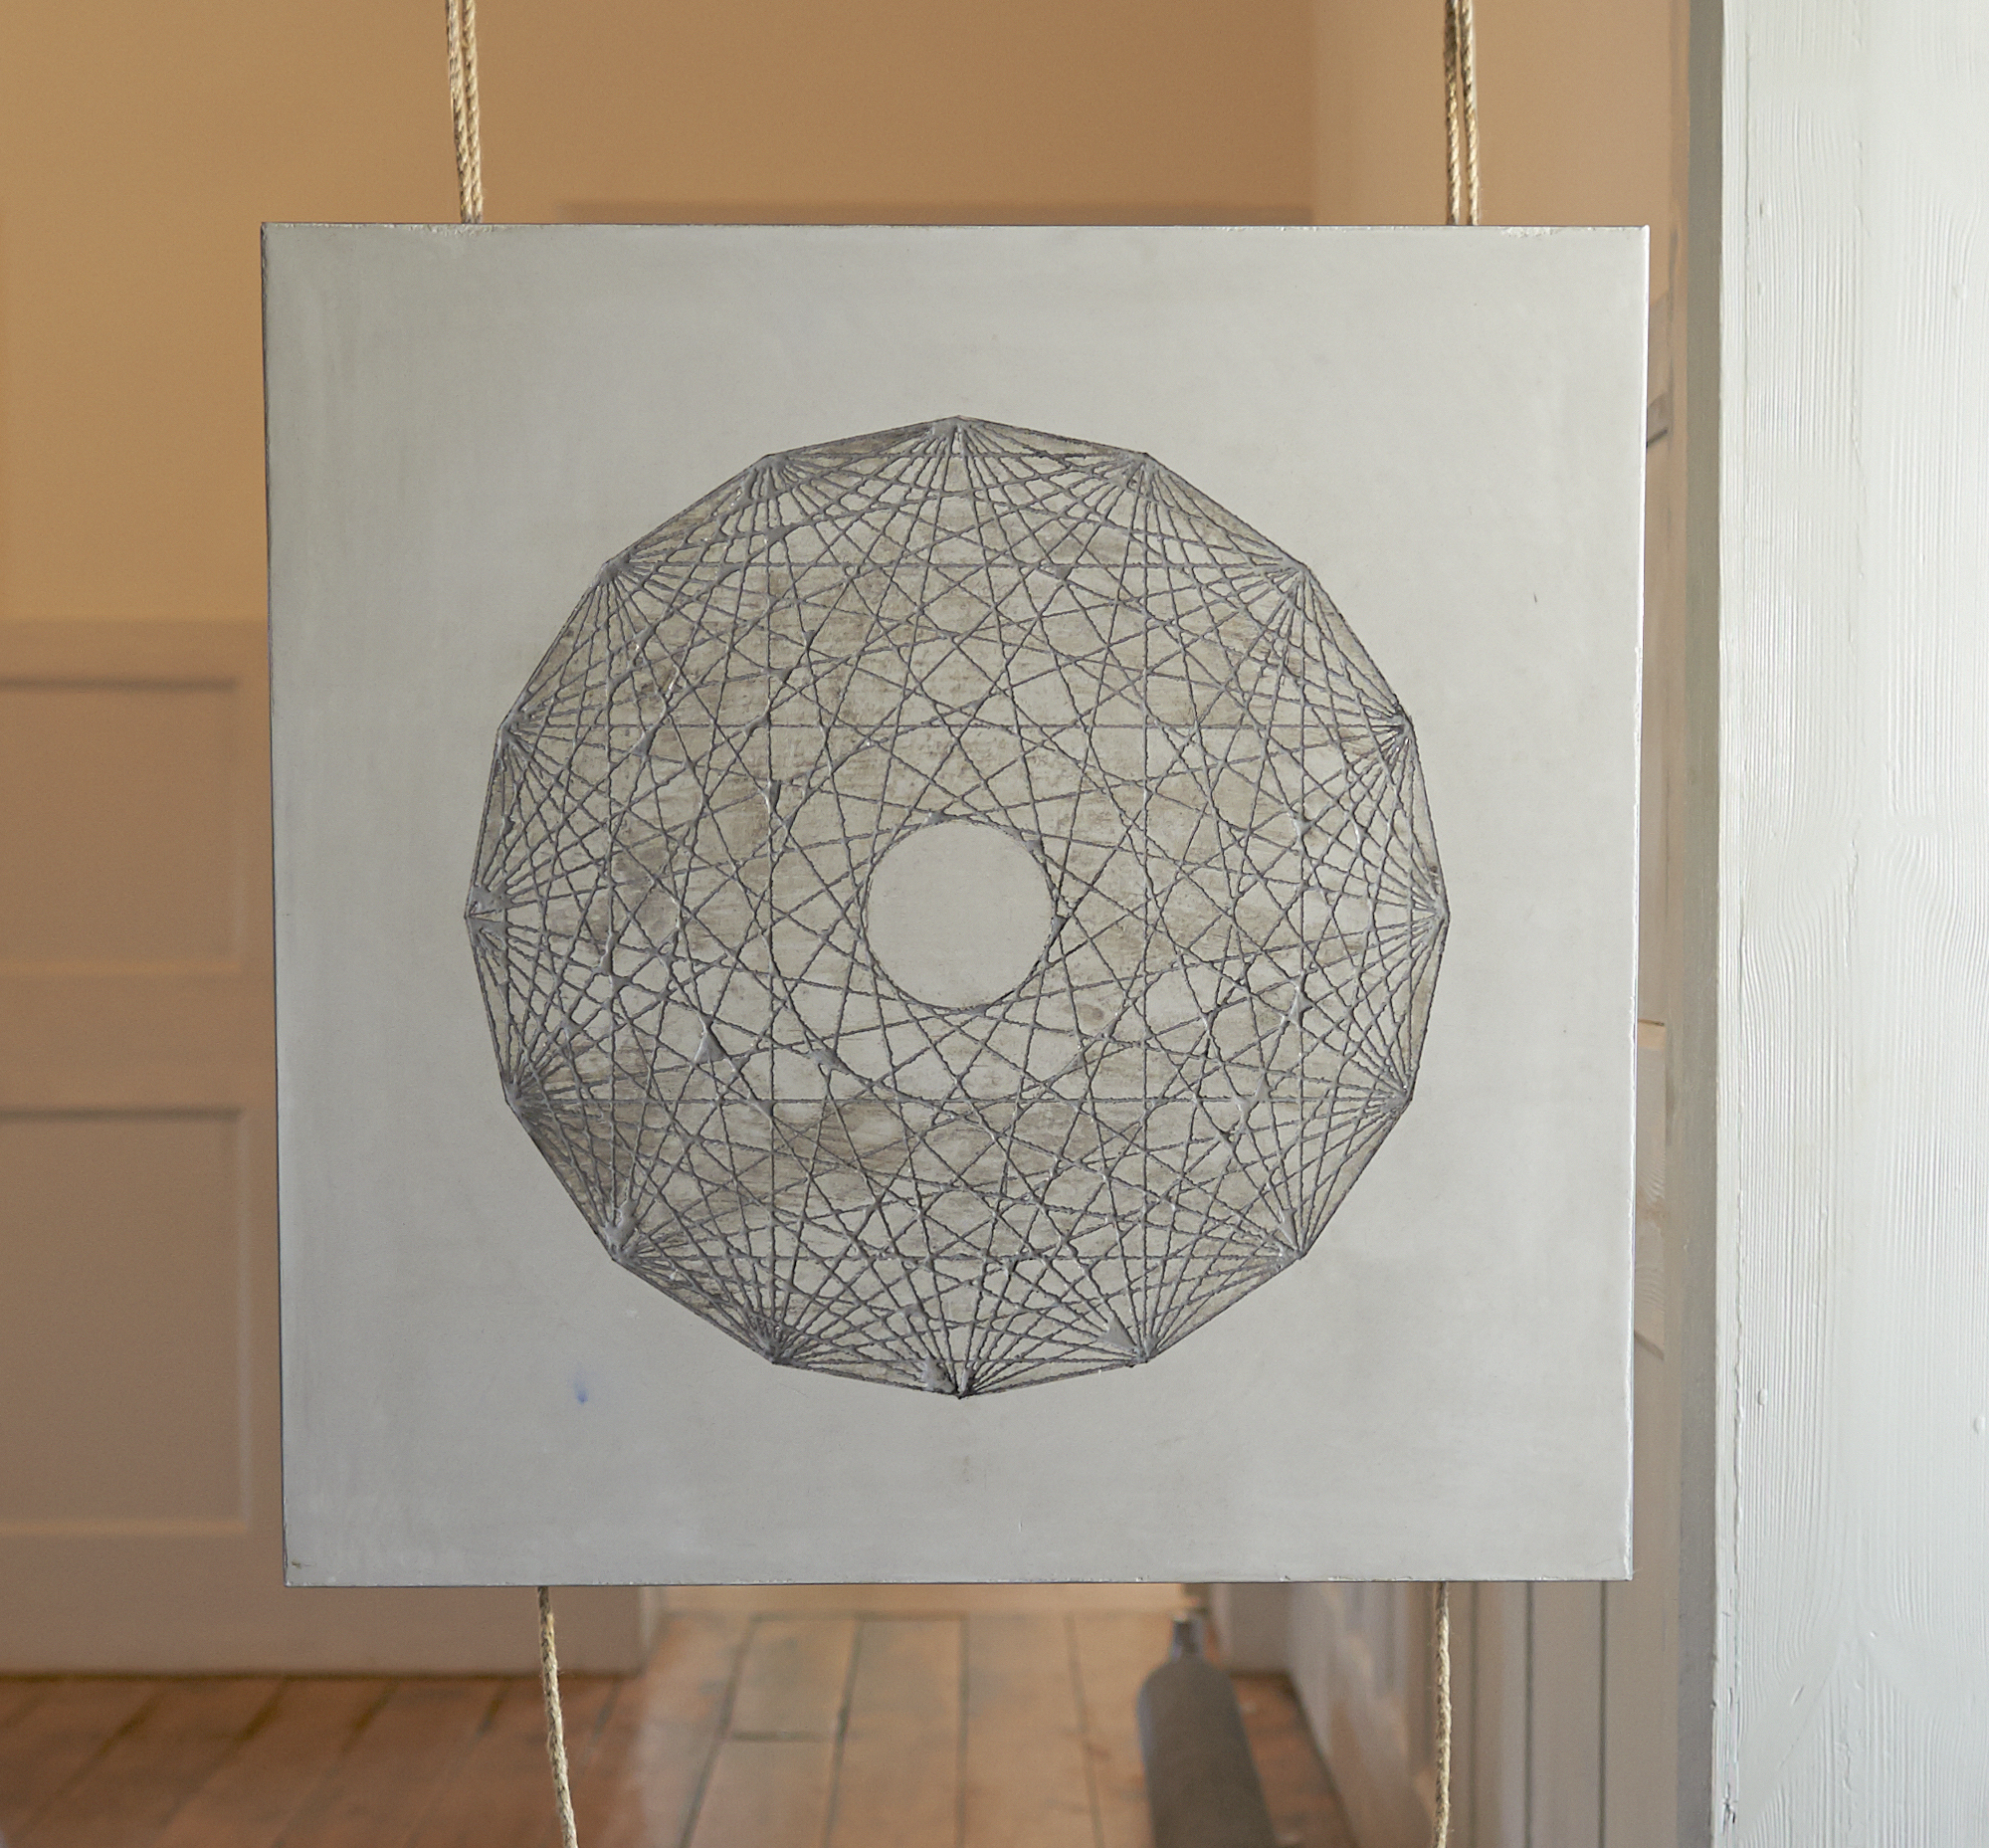 PORTAL:   60 x 60cm / 80 x 80cm - from £950 unframed